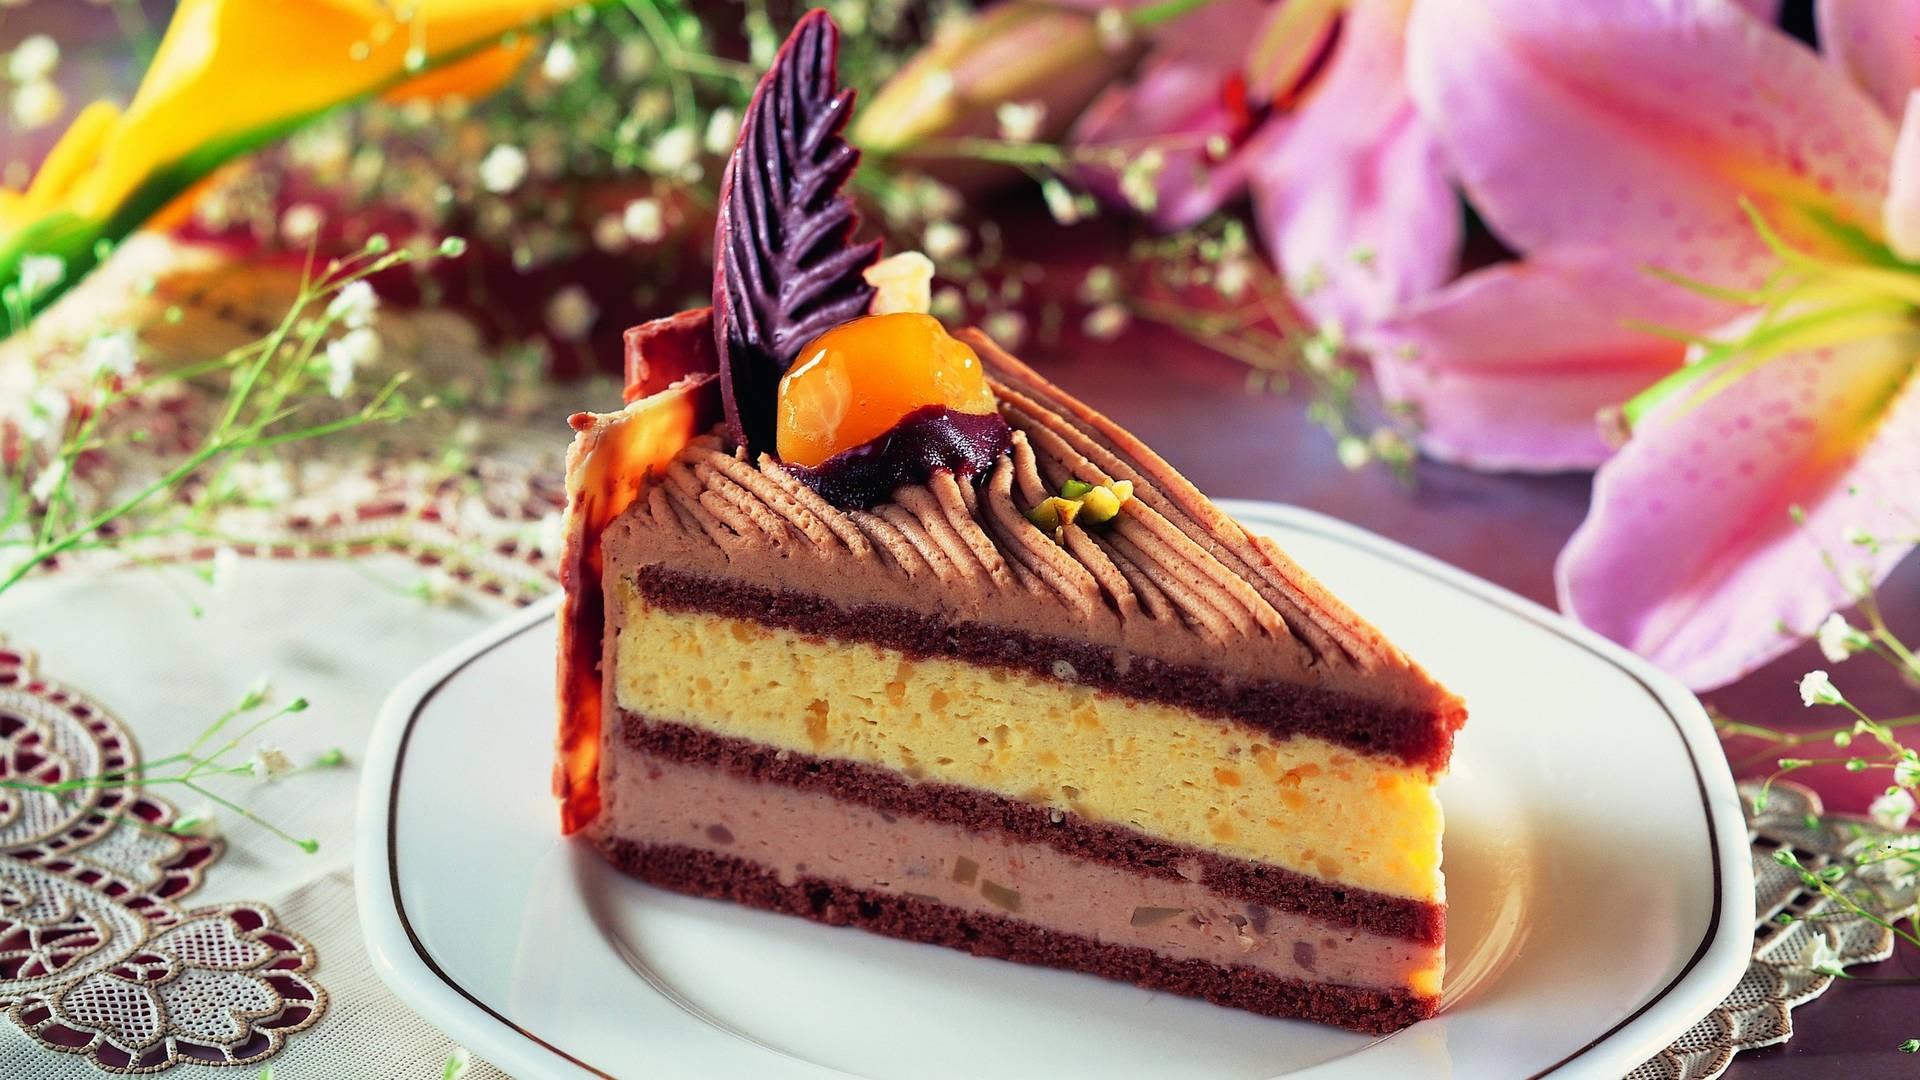 ppt图片素材 蛋糕